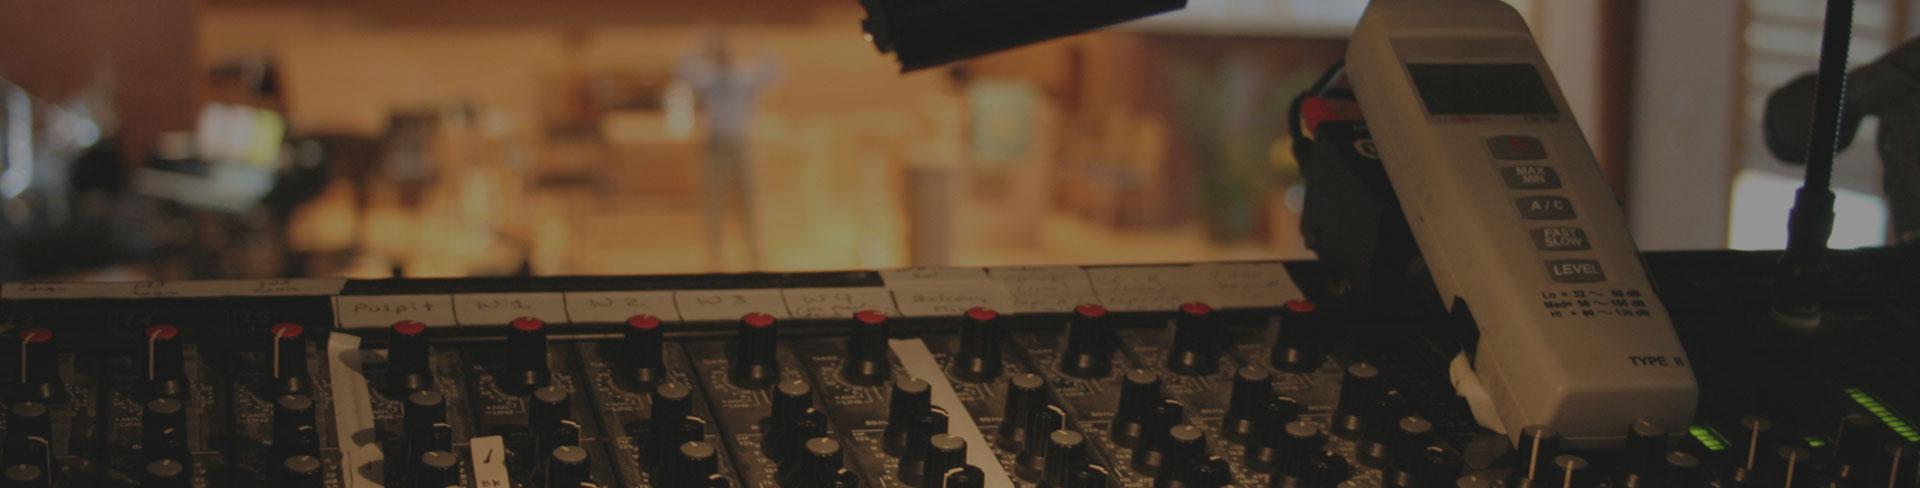 Sound System & PA Rental Dublin, Ireland - Delivery & Setup